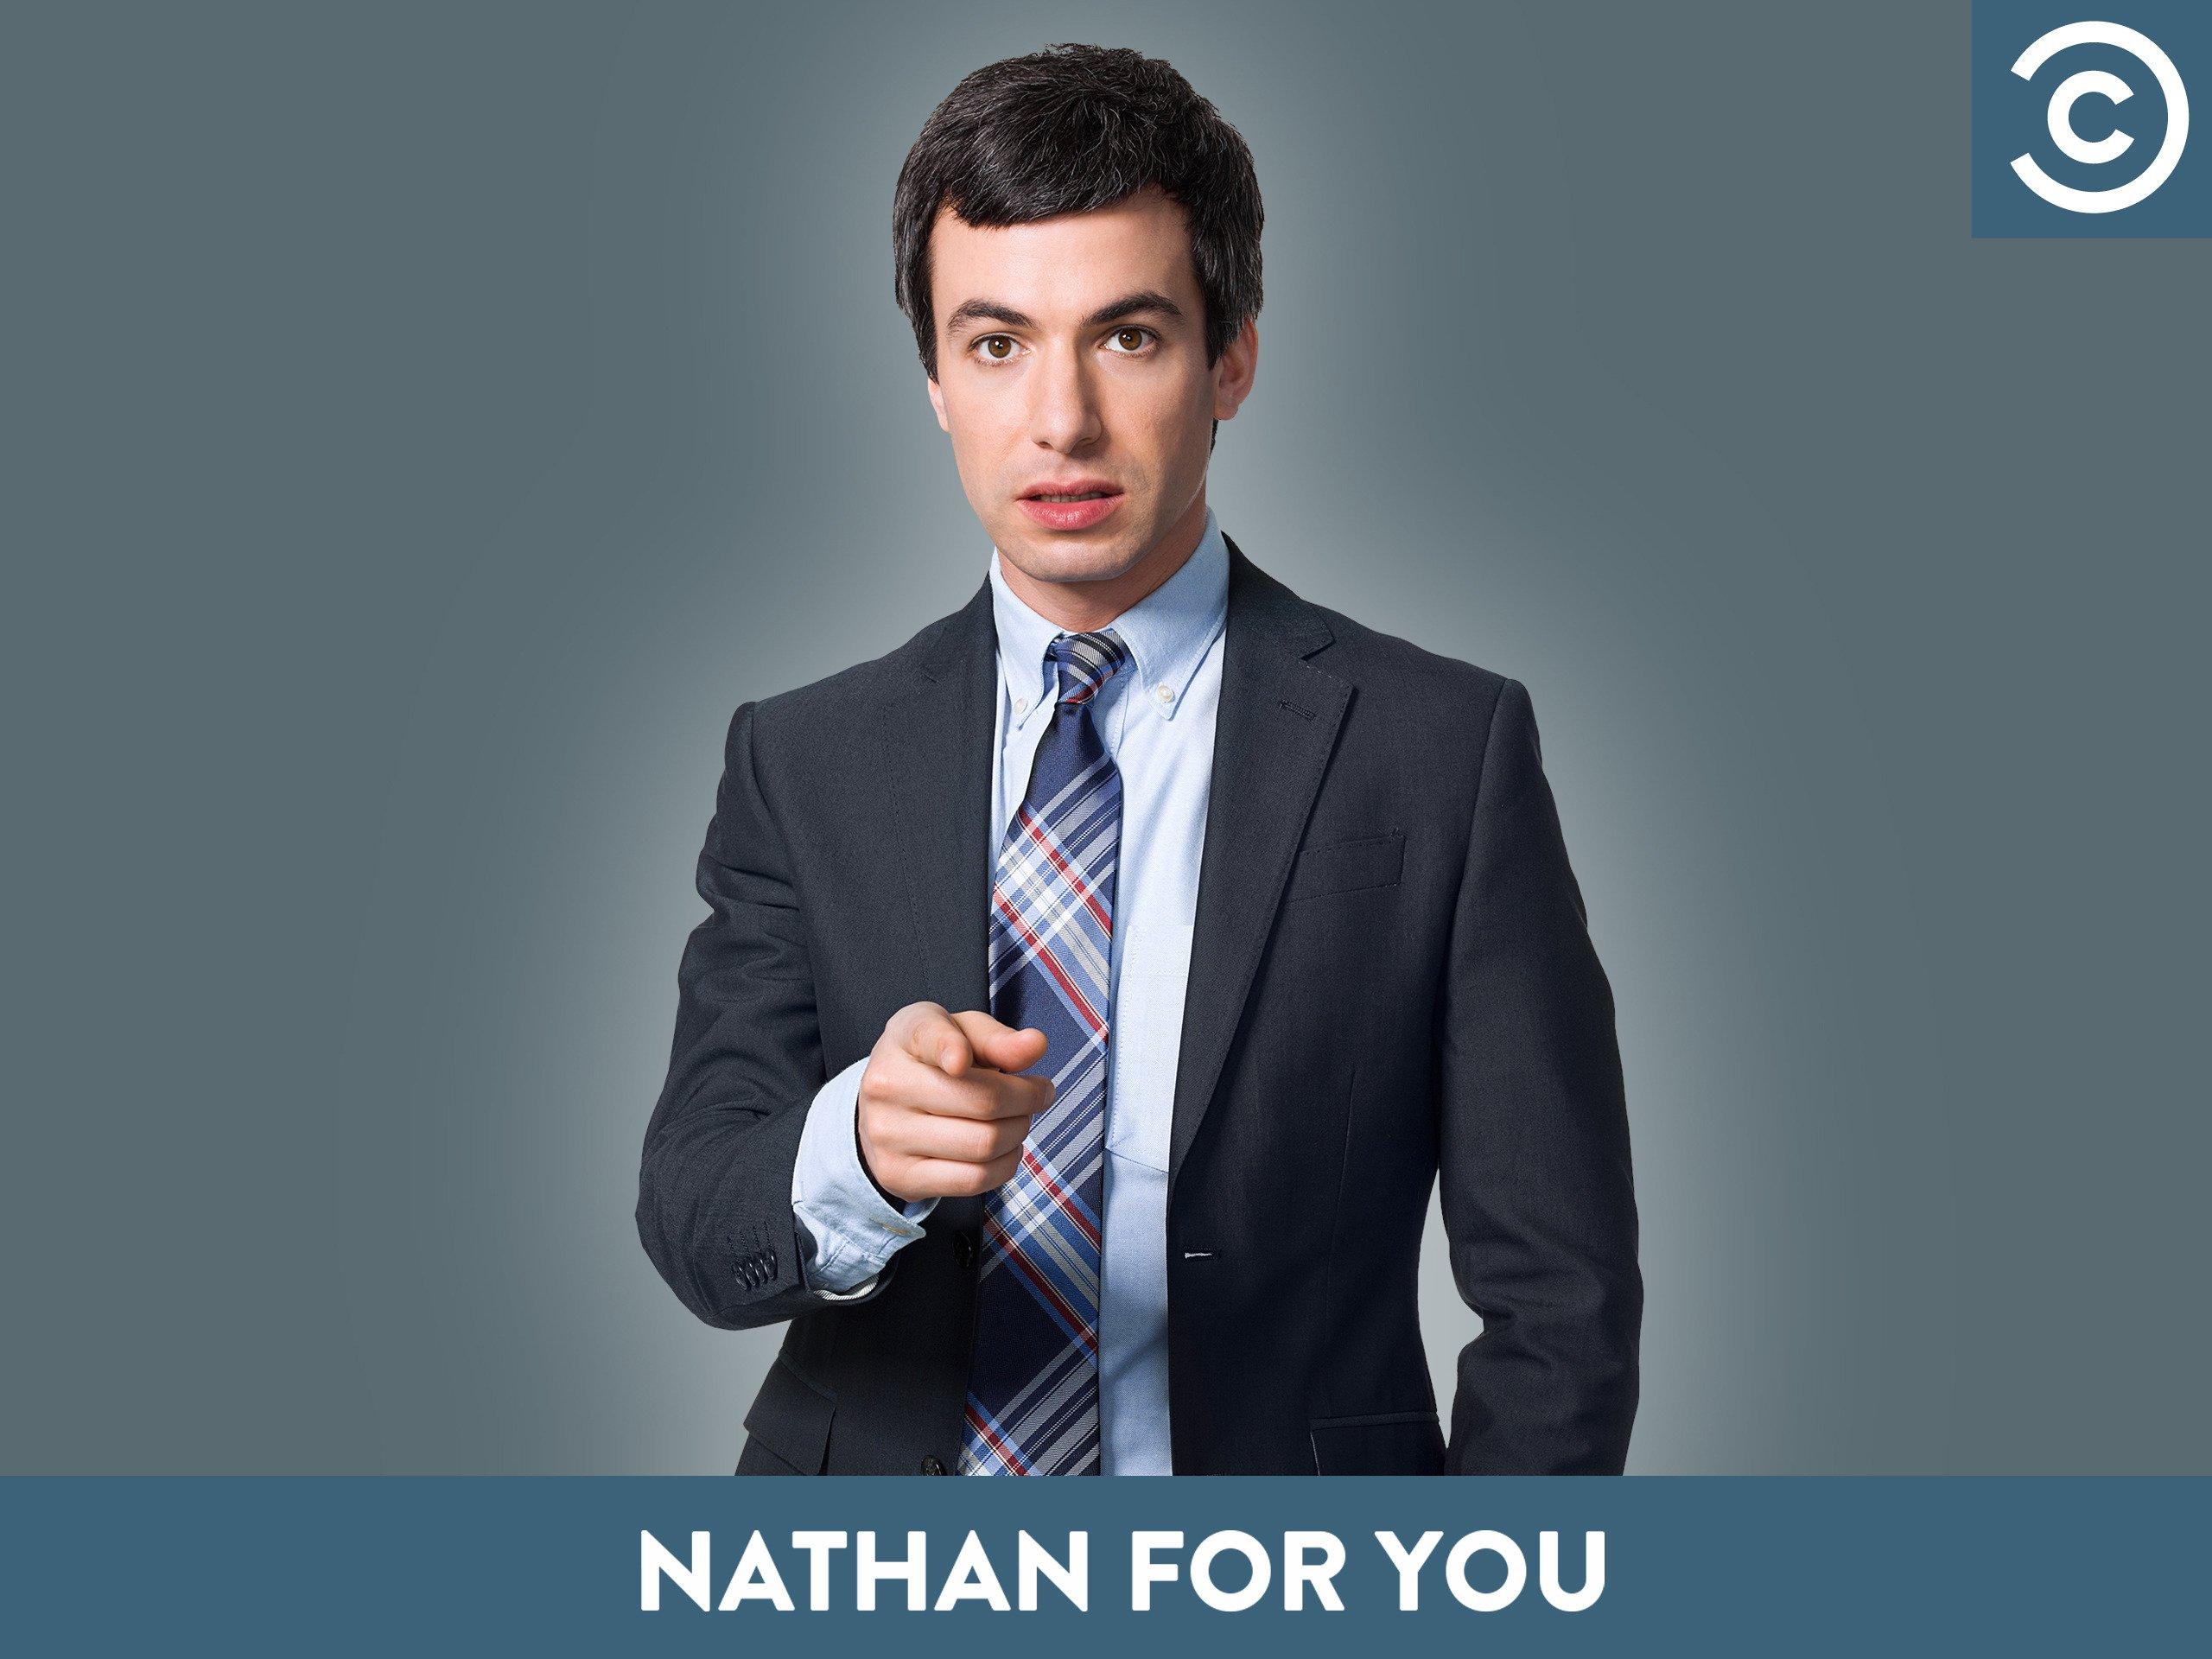 Amazon com: Watch Nathan For You Season 4 | Prime Video